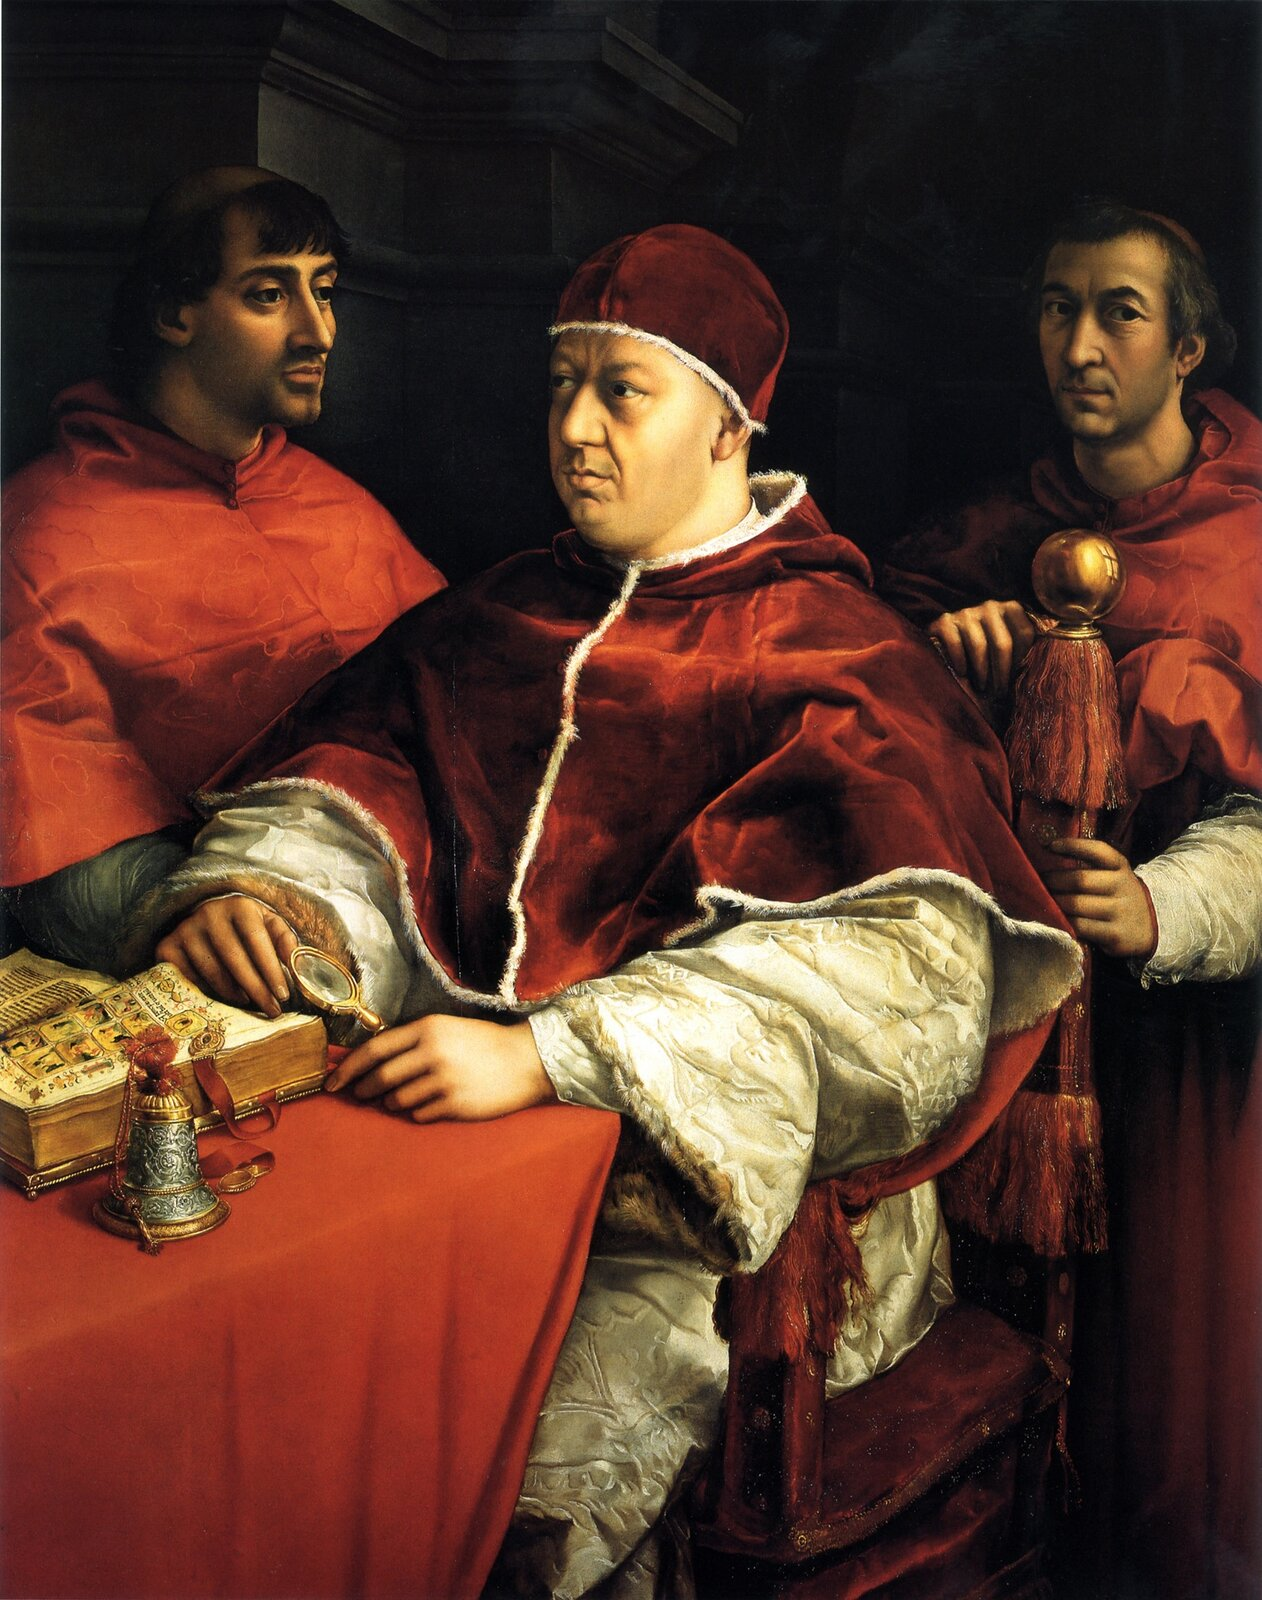 Leon XŹródło: Rafael Santi, Leon X, 1518-1519, olej na desce, Galeria Uffizi, domena publiczna.